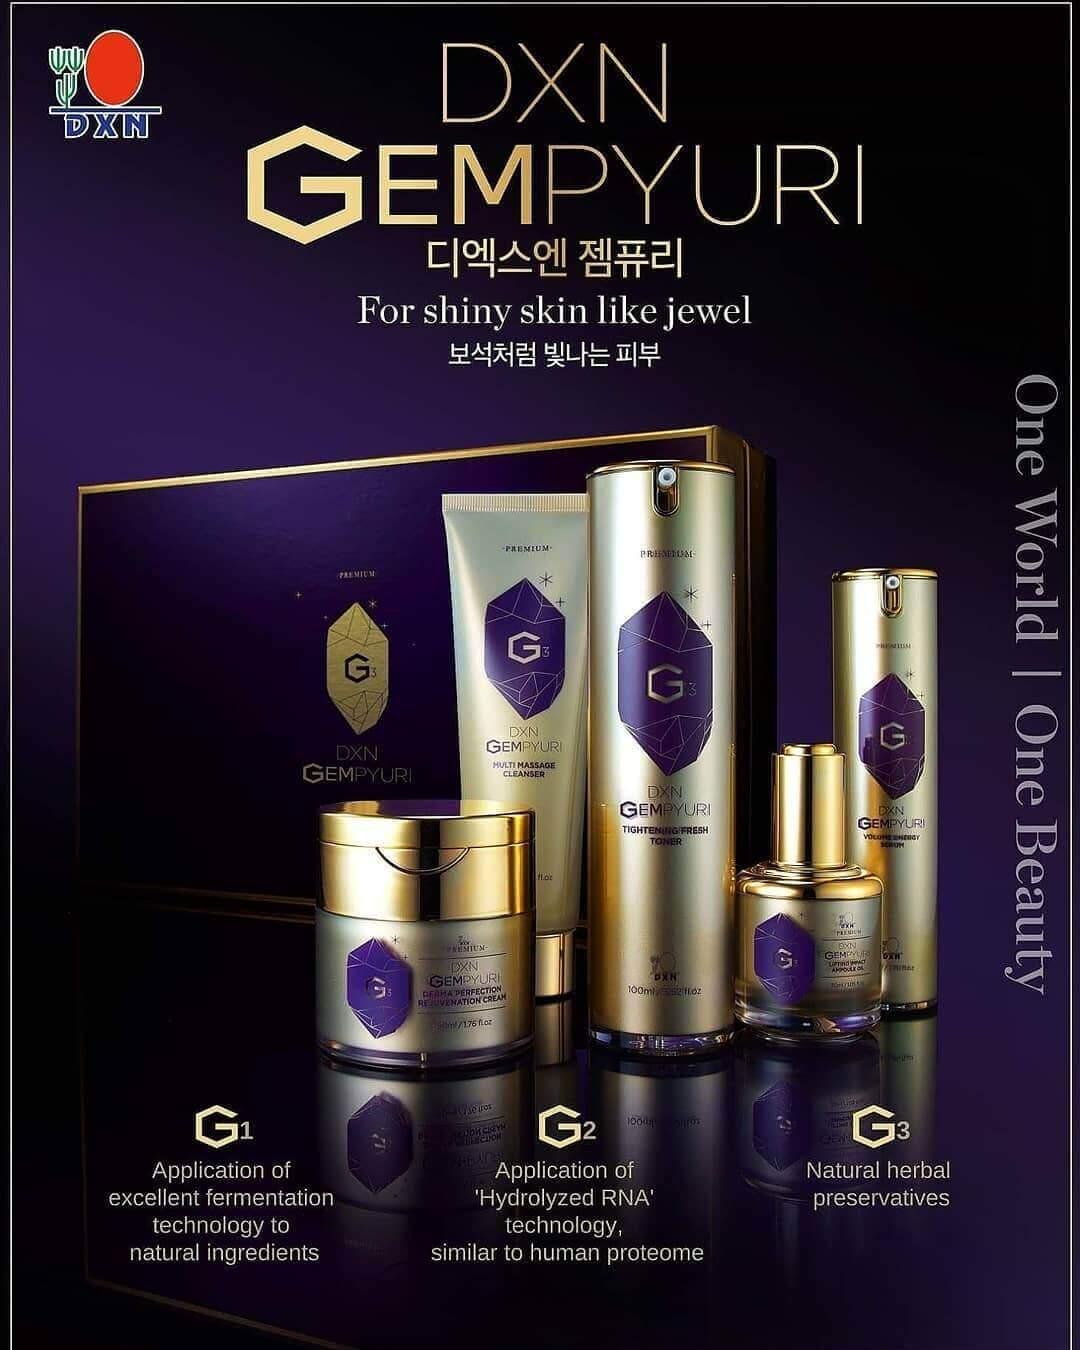 DXN Beauty - Die neue Kosmetik Produktfamilien mit Reishi Pilz Extrakt